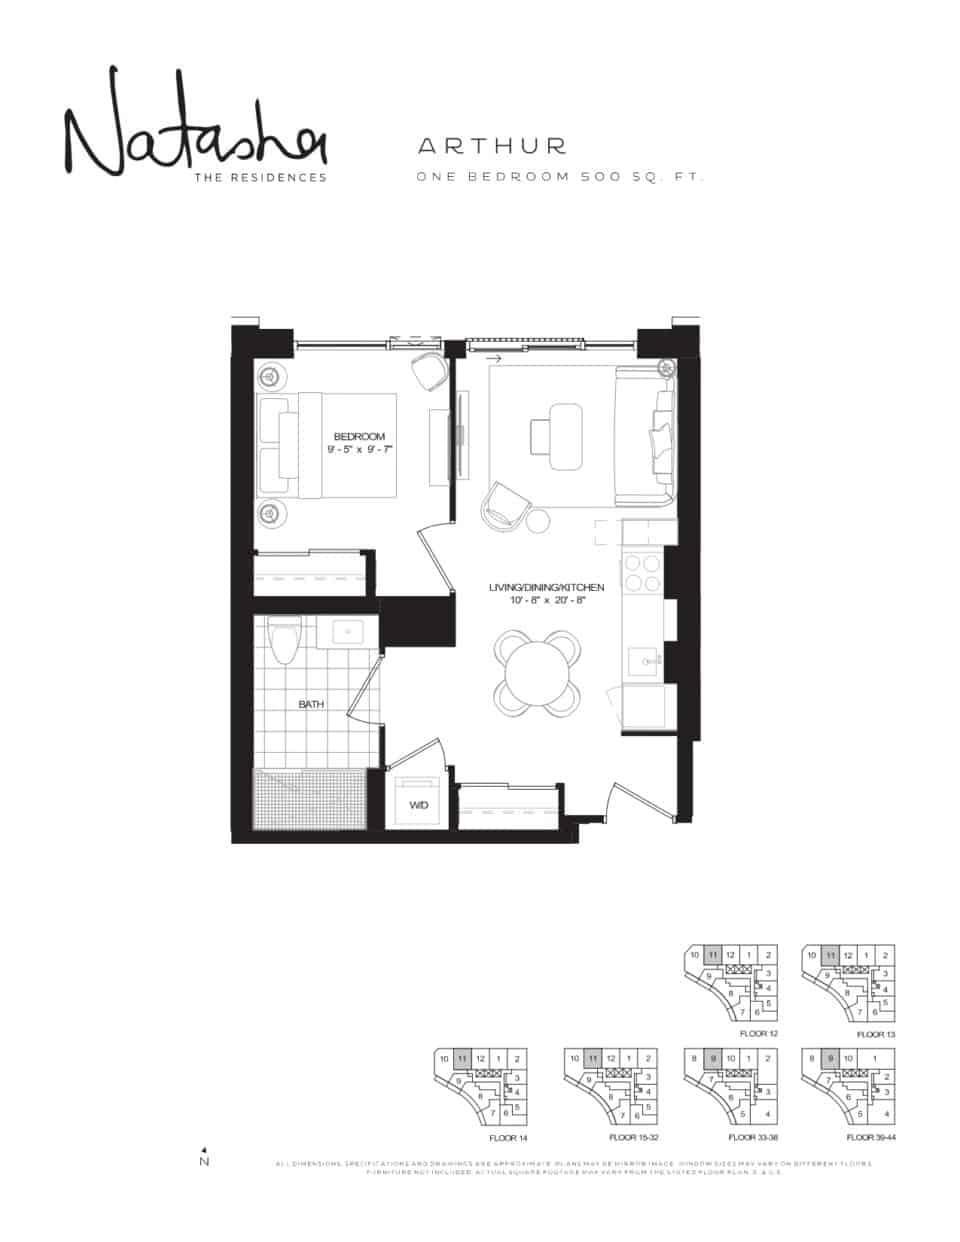 2021 09 02 11 01 53 natashatheresidences lanterradevelopments floorplans arthur